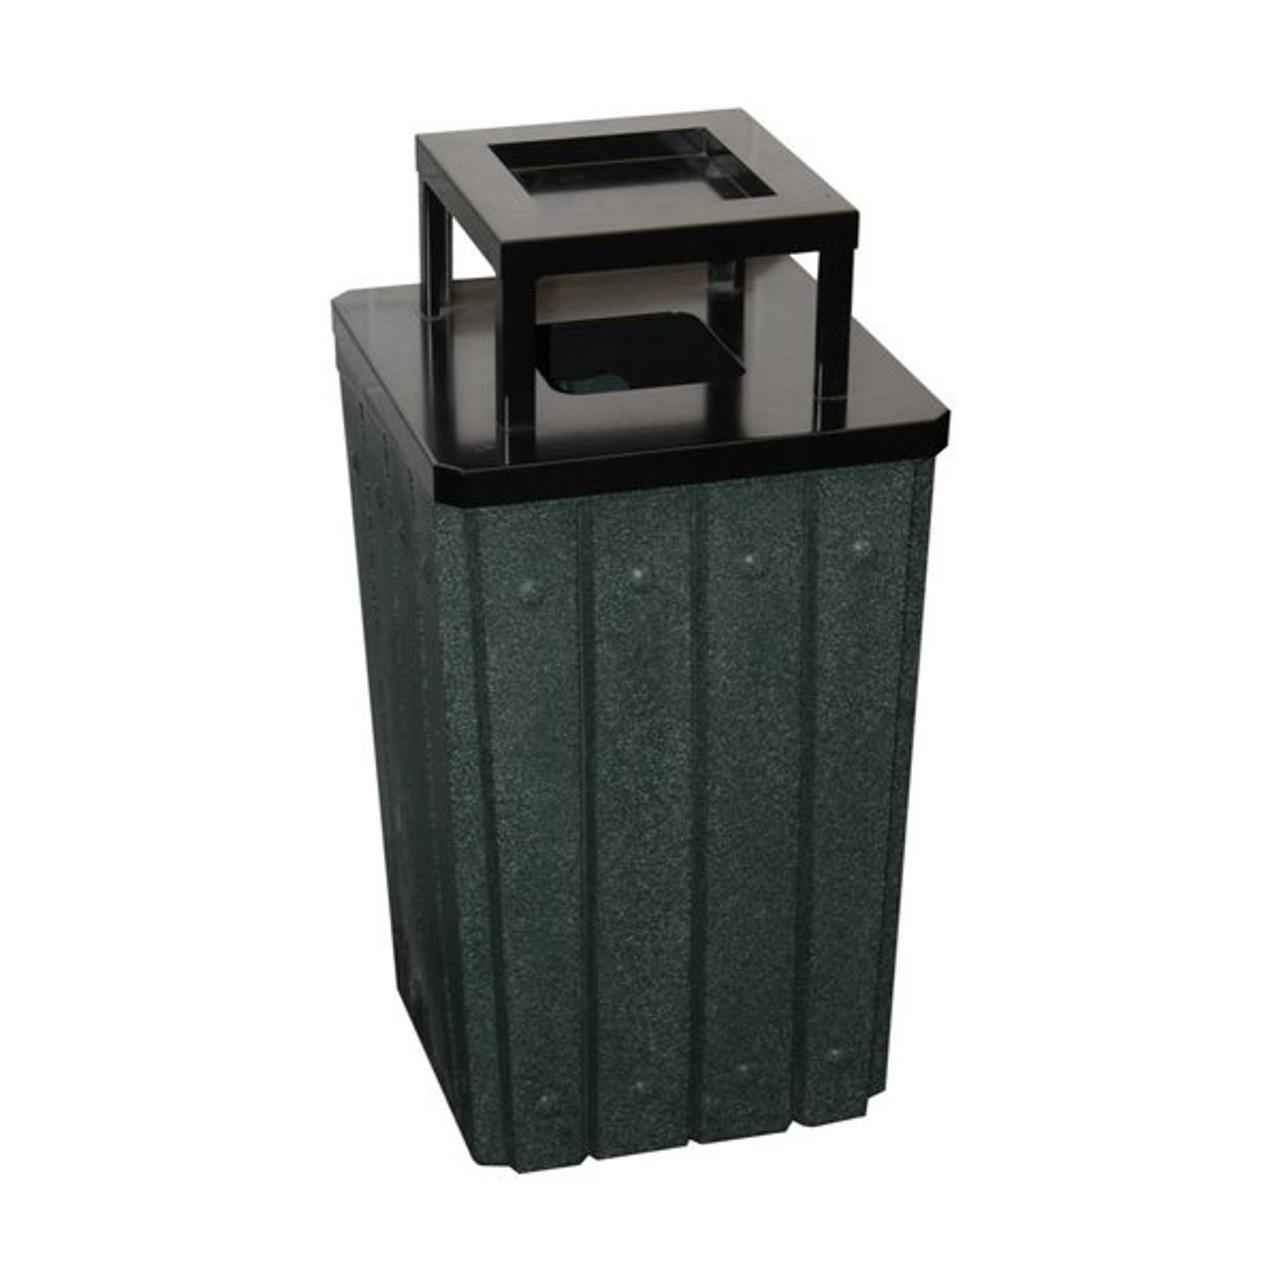 Kolor Can Signature 32 Gallon Heavy Duty Trash Receptacle with Ashtray Lid GREEN GRANITE